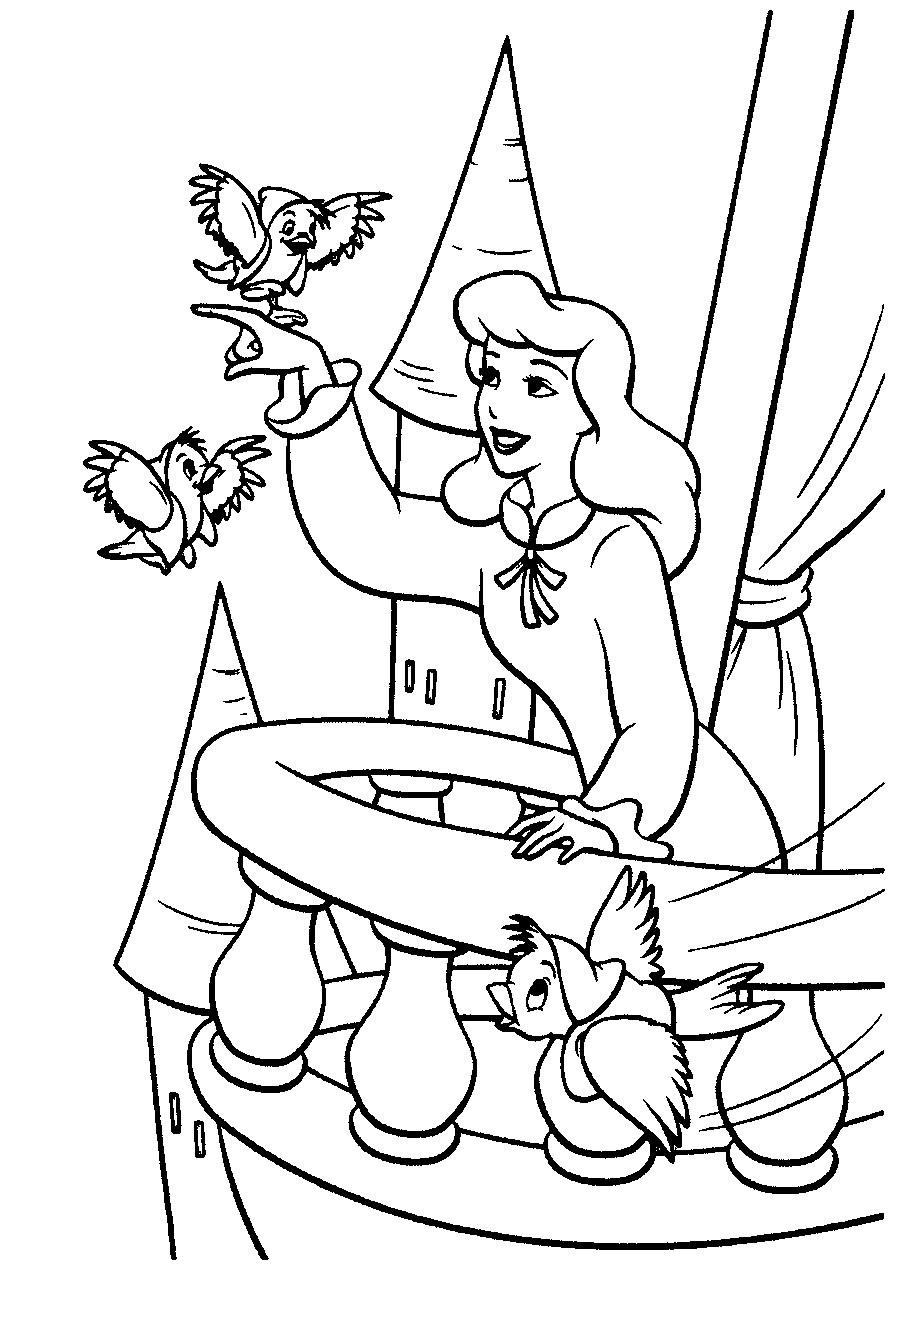 Coloring Pages Cinderella  Cinderella Coloring Pages To Print